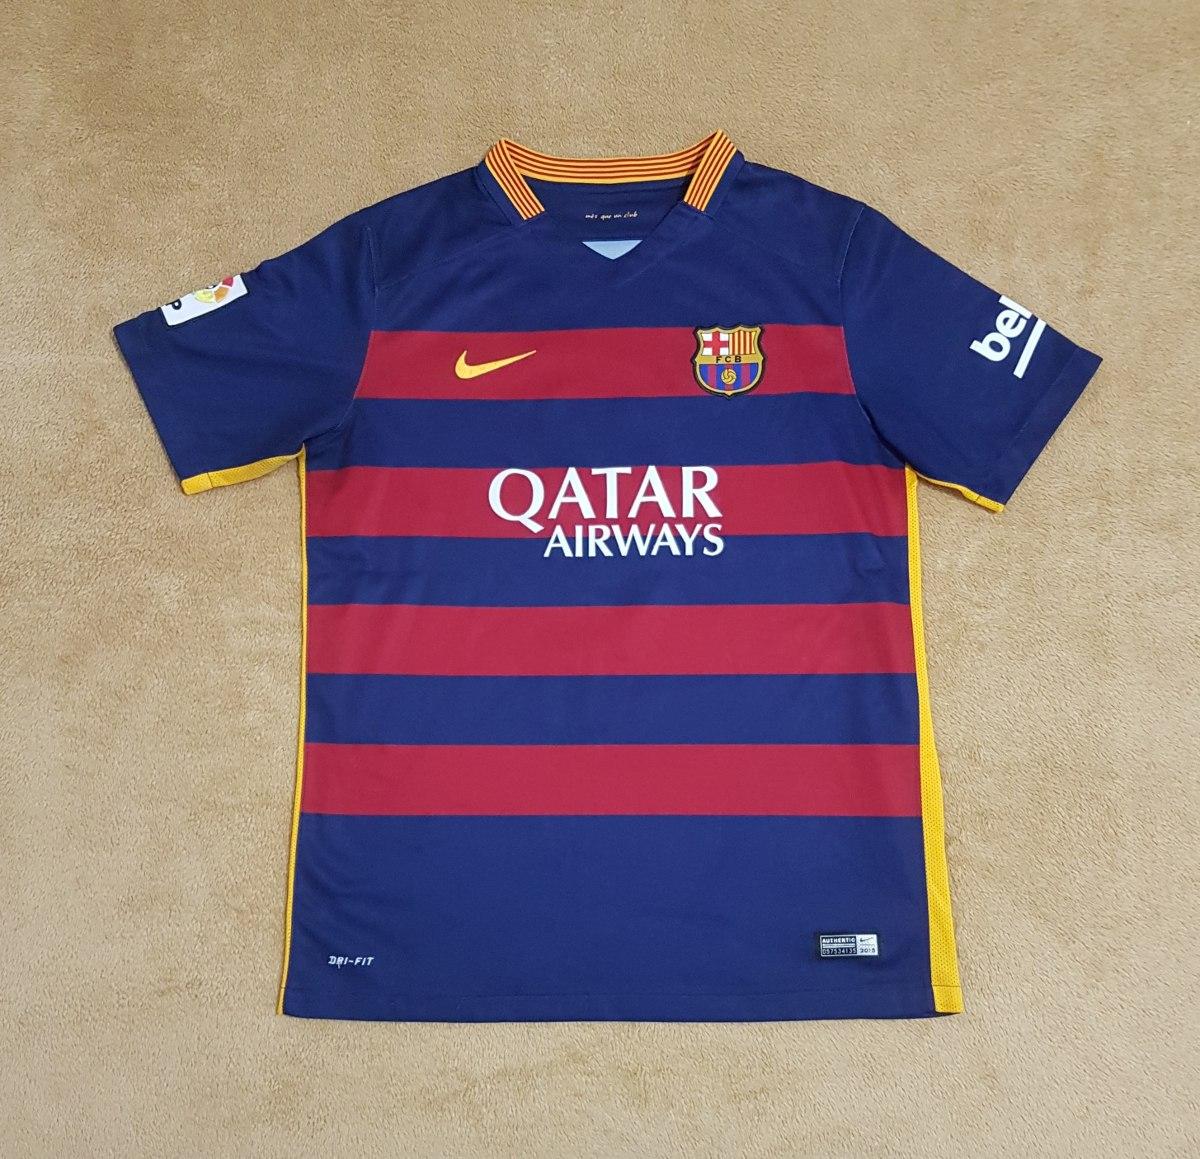 d3218c657c gcr04 camisa oficial barcelona 2015 2016  11 neymar pp 65x47. Carregando  zoom.